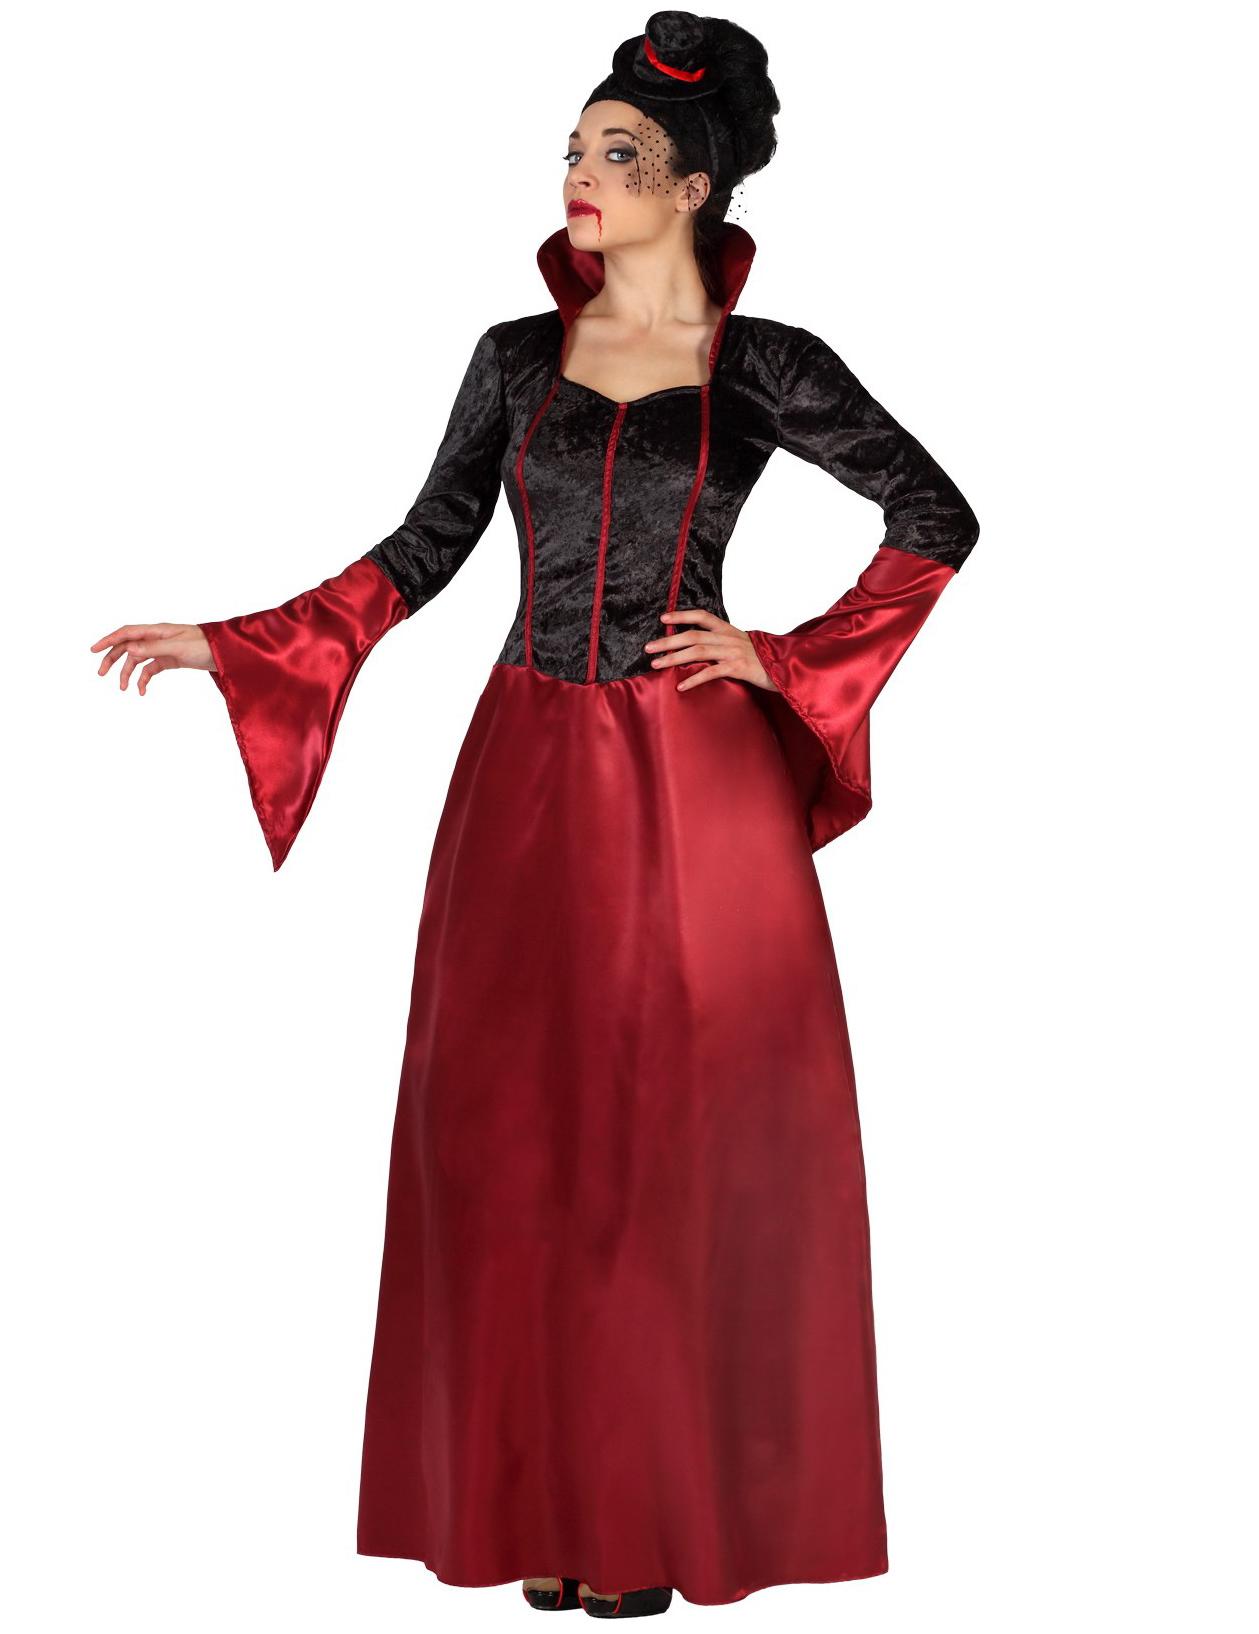 d guisement vampire rouge et noir femme halloween. Black Bedroom Furniture Sets. Home Design Ideas